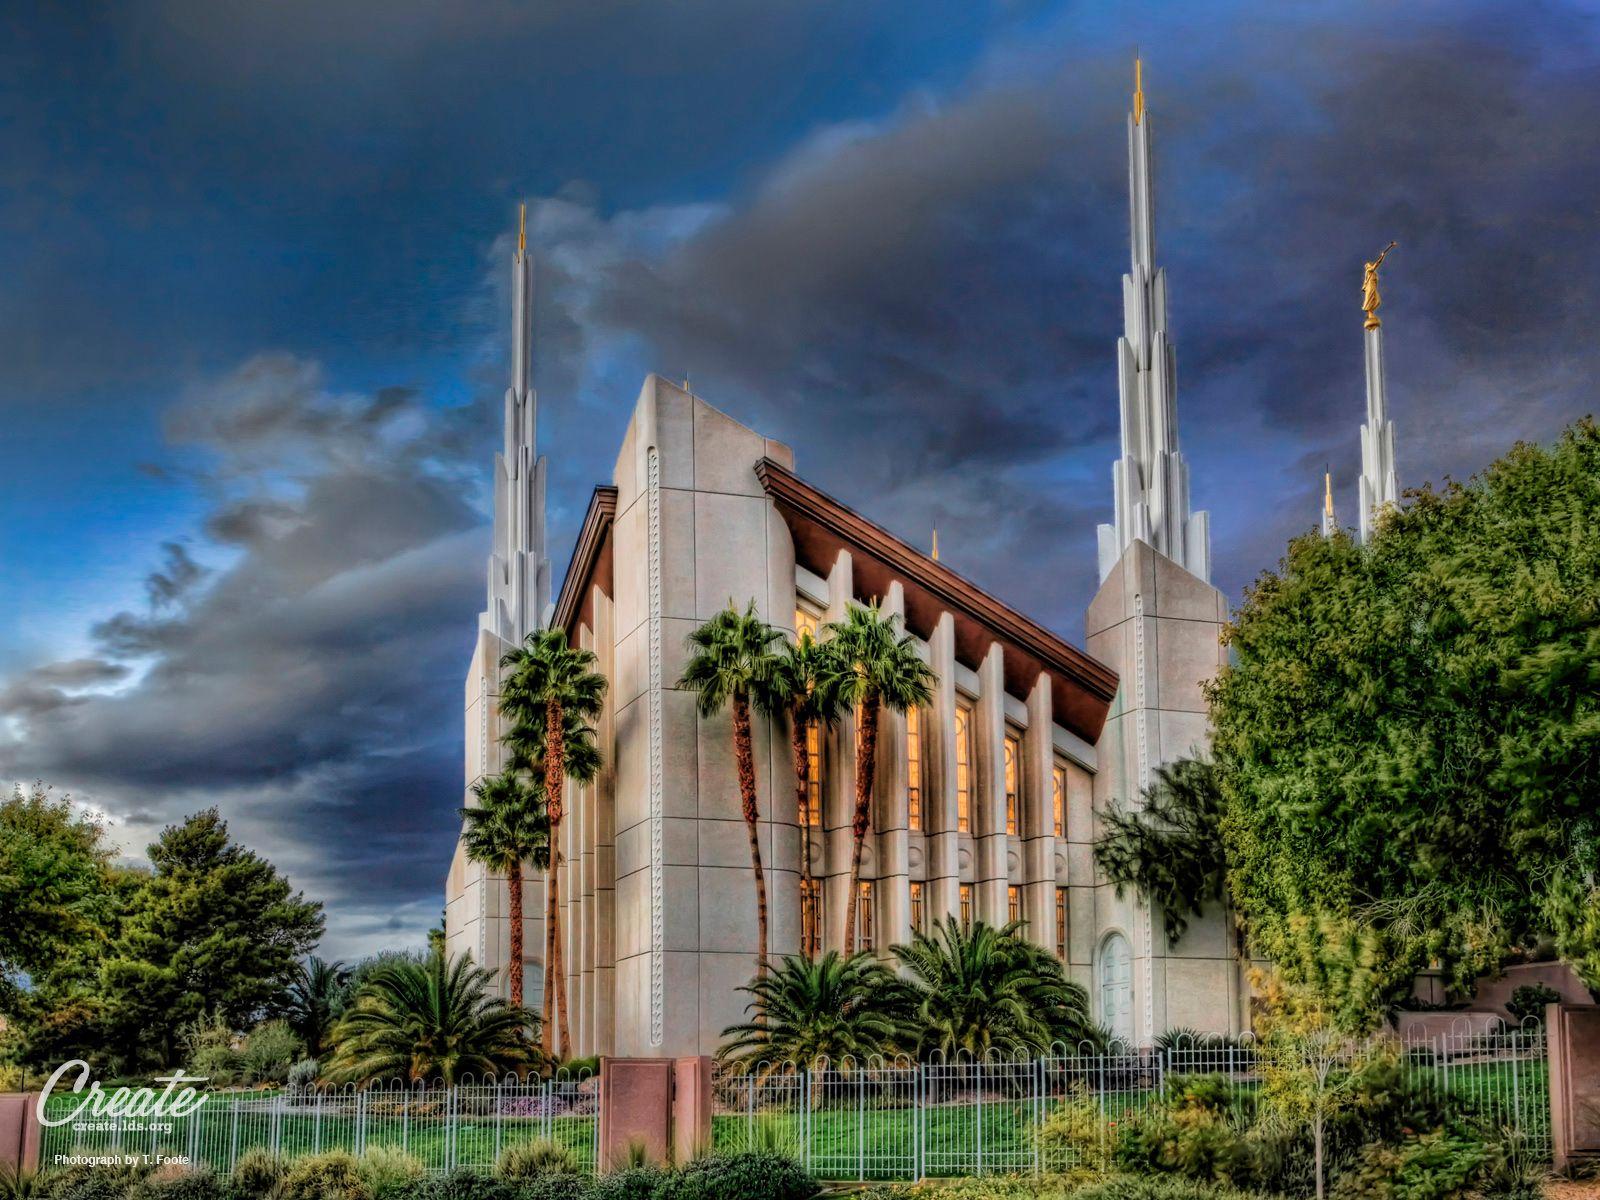 Las Vegas Nevada LDS Temple Wallpaper Find It At Createldsorg